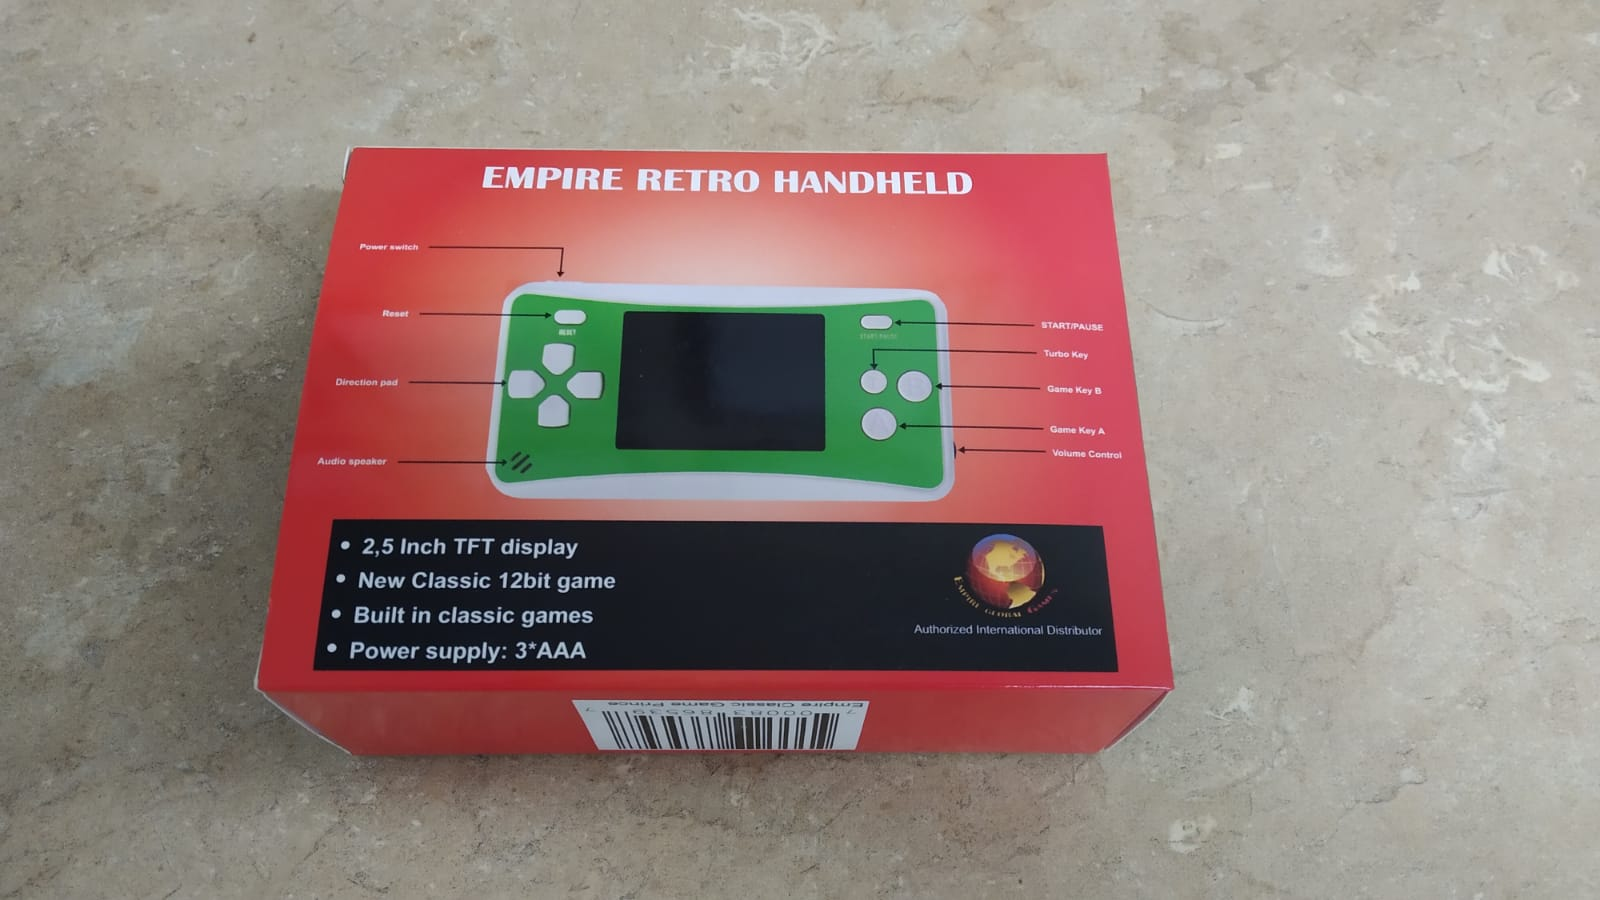 Empire retro handheld